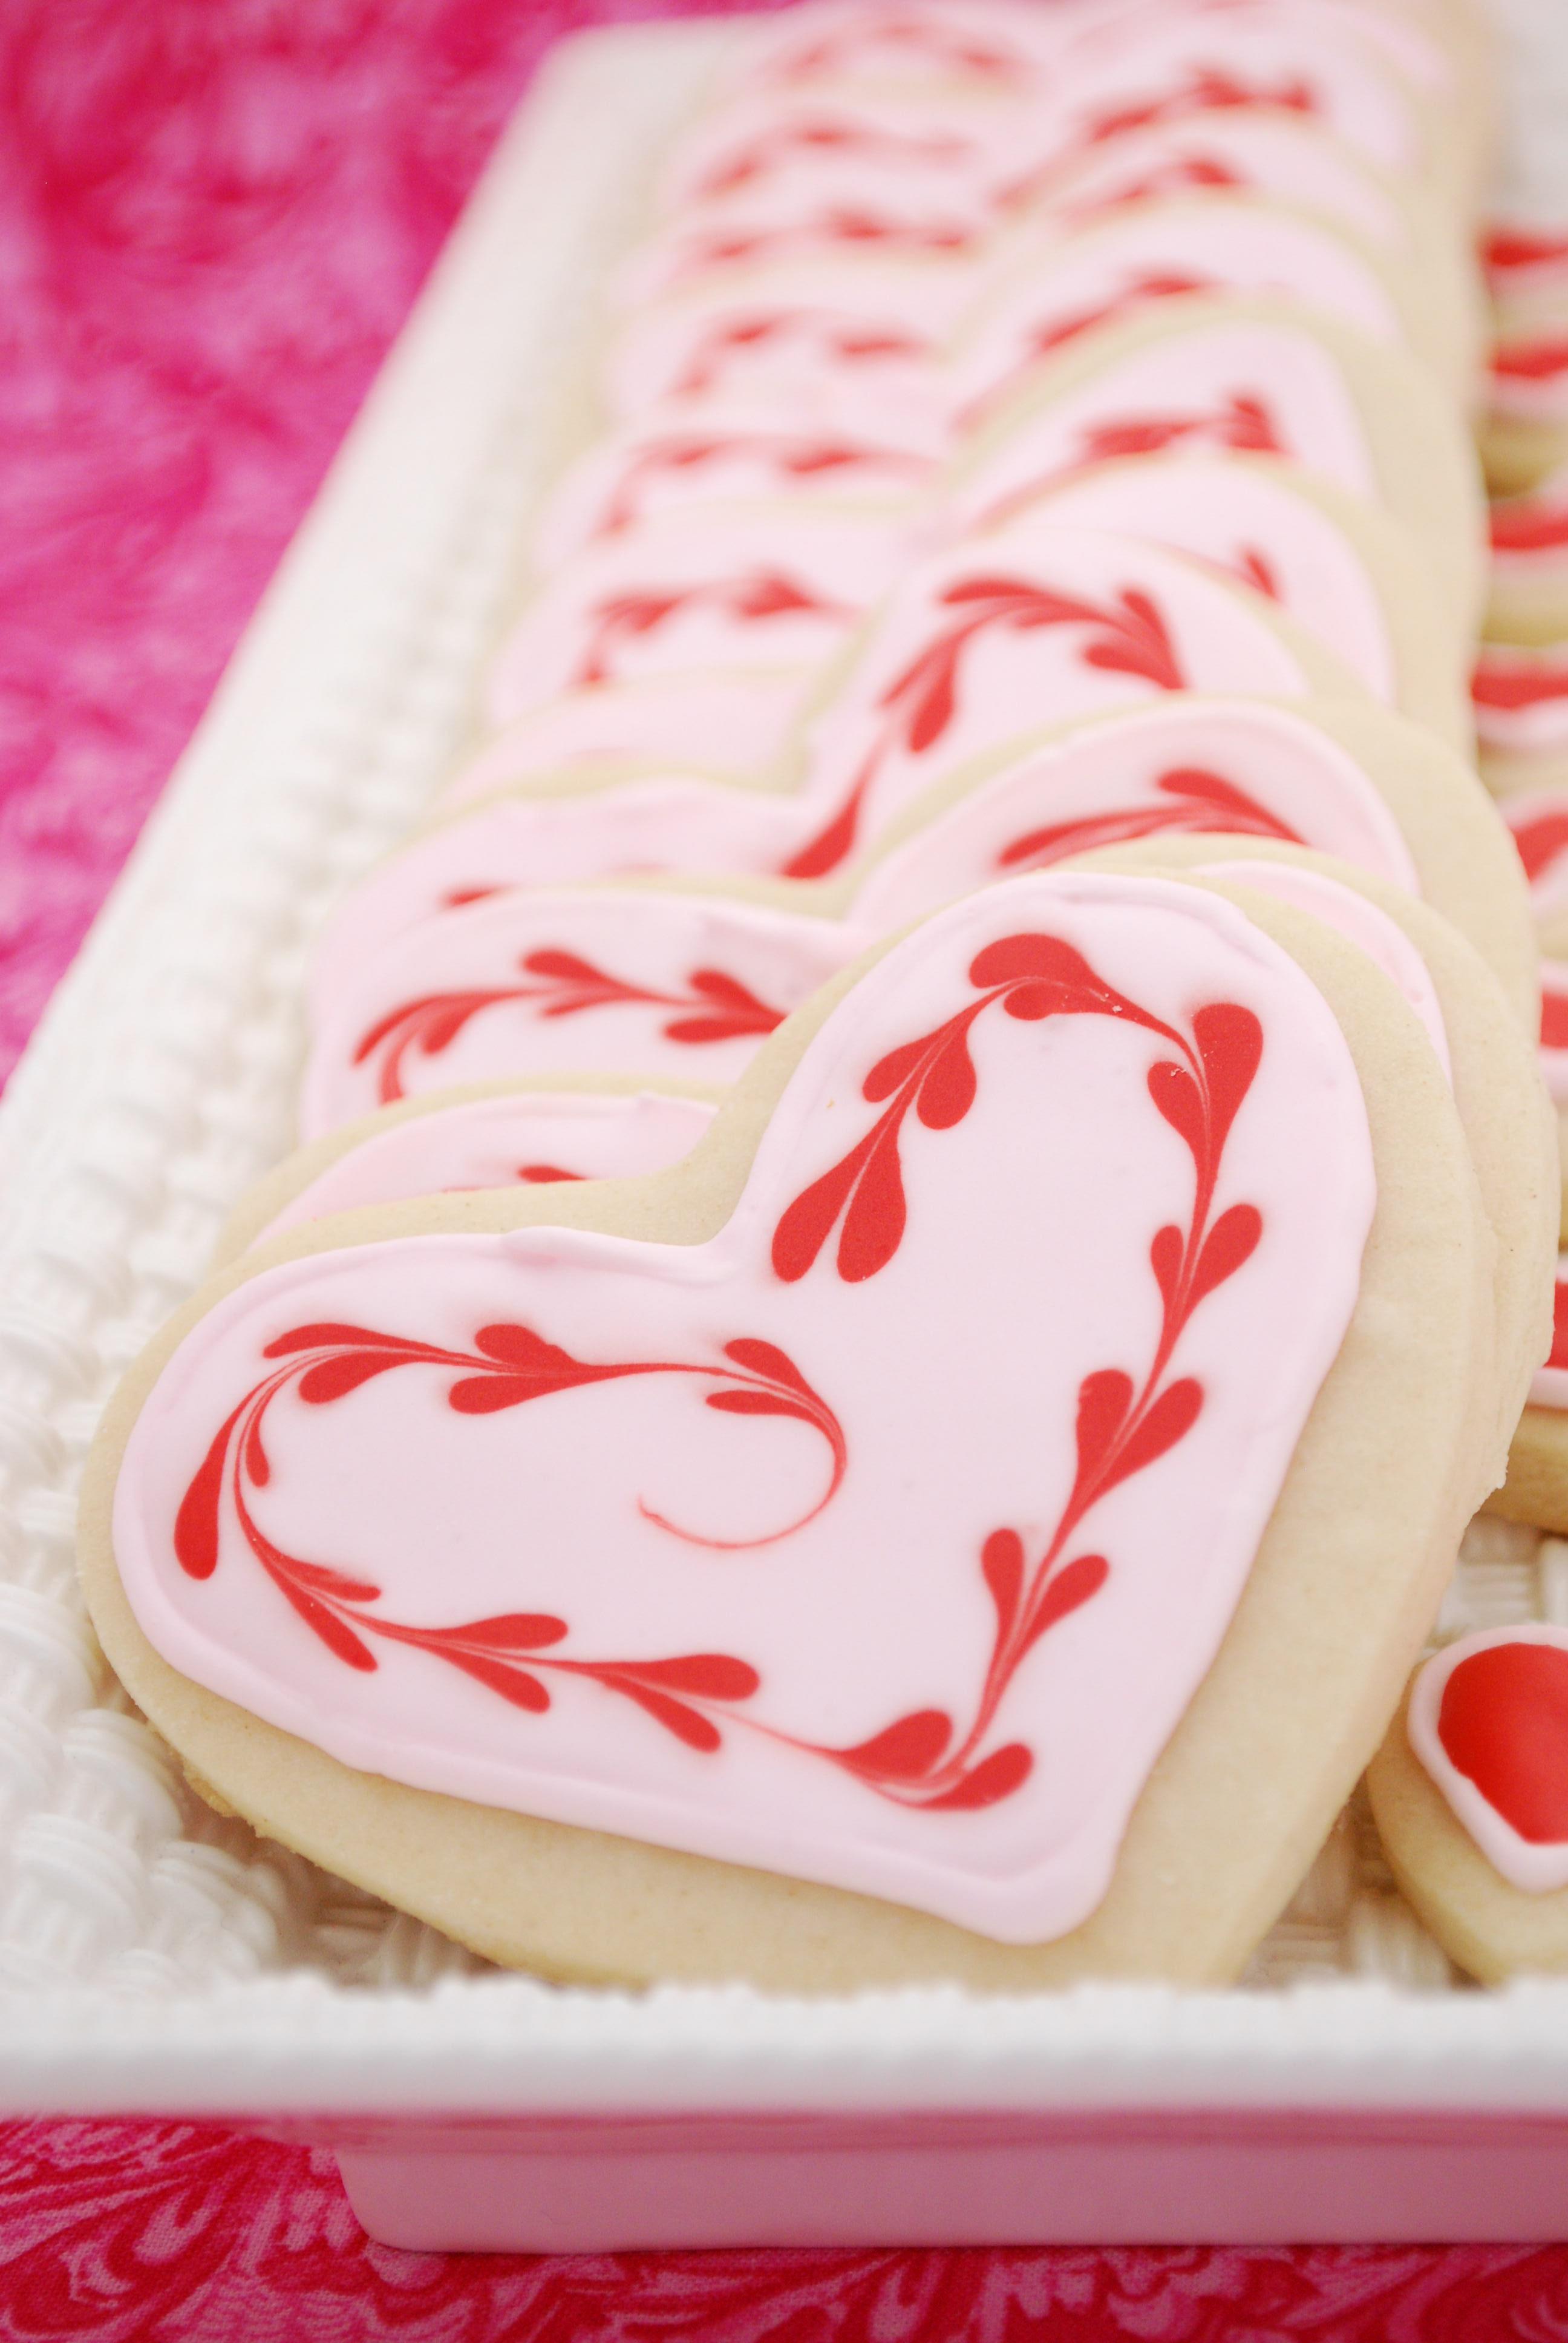 Royal Icing Recipe For Sugar Cookies  Sugar Cookies with Royal Icing Recipe